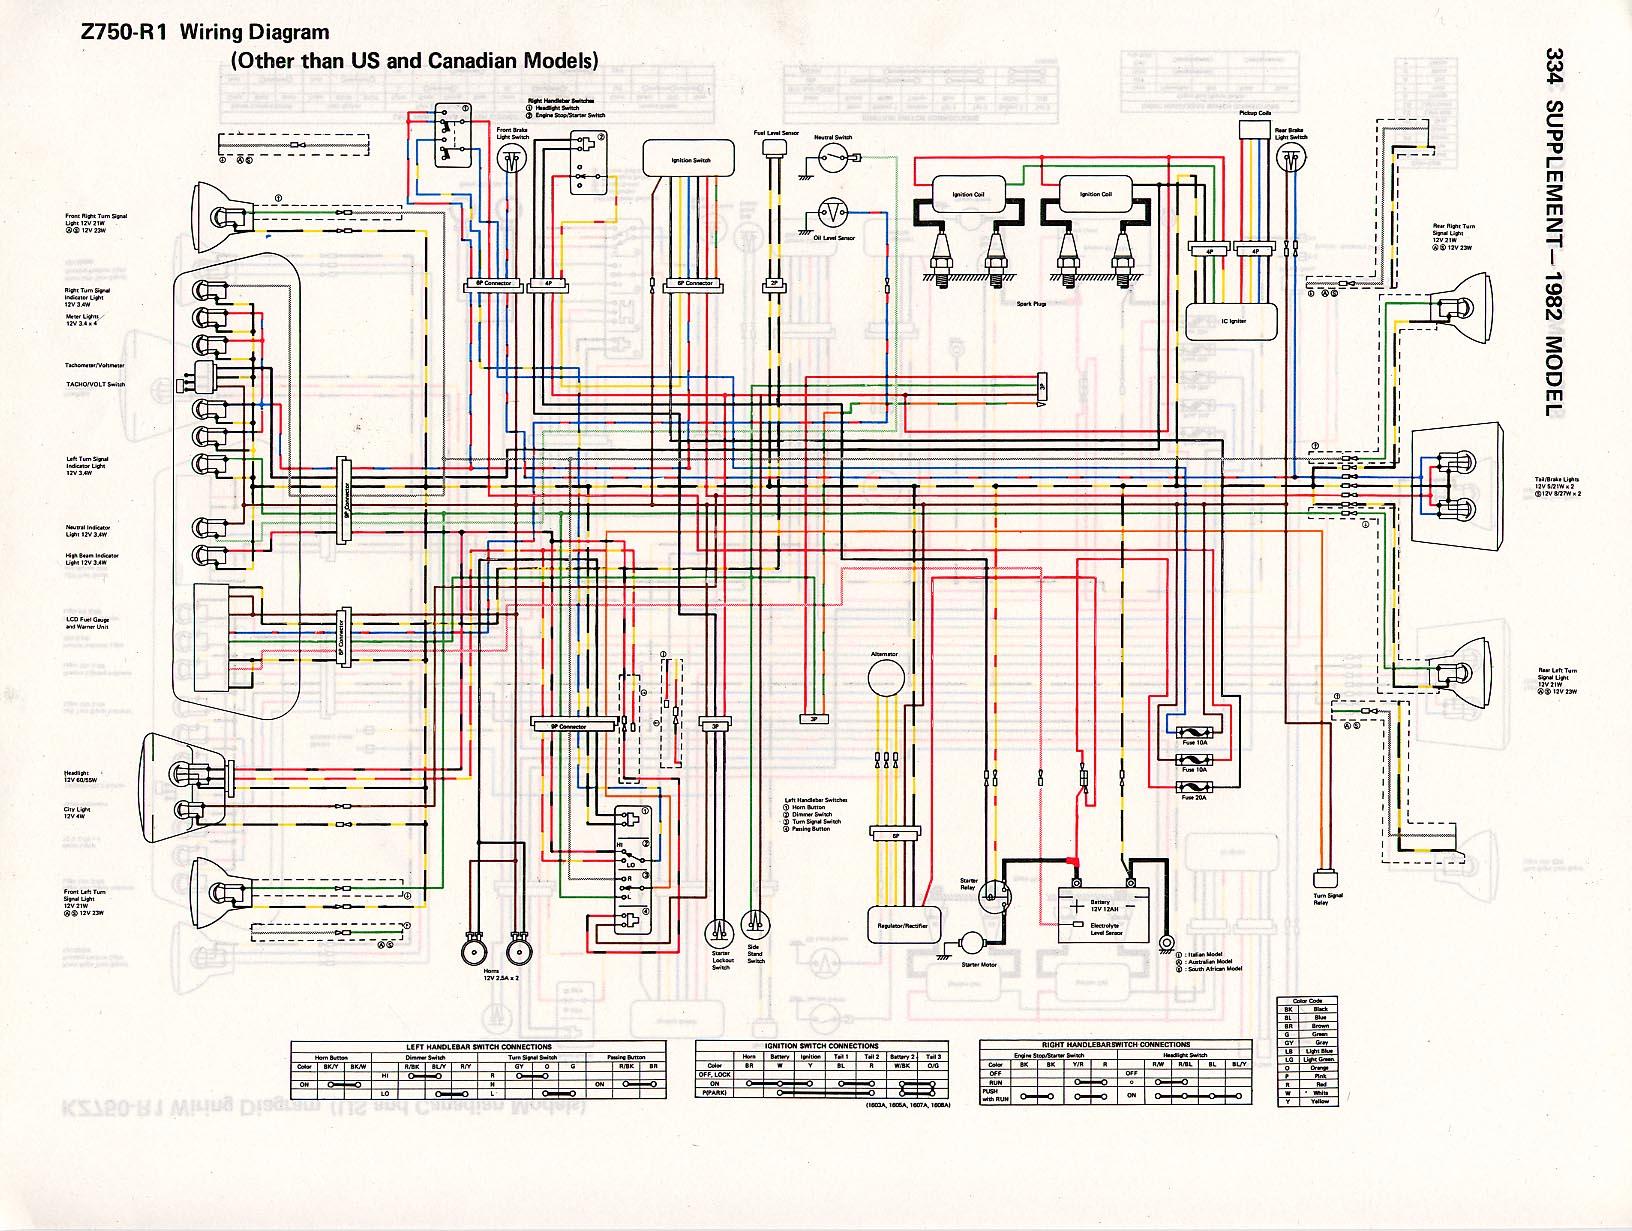 Kawasaki Concours 14 Wiring Diagram - 1969 Camaro Instrument Wiring  Schematic for Wiring Diagram SchematicsWiring Diagram Schematics